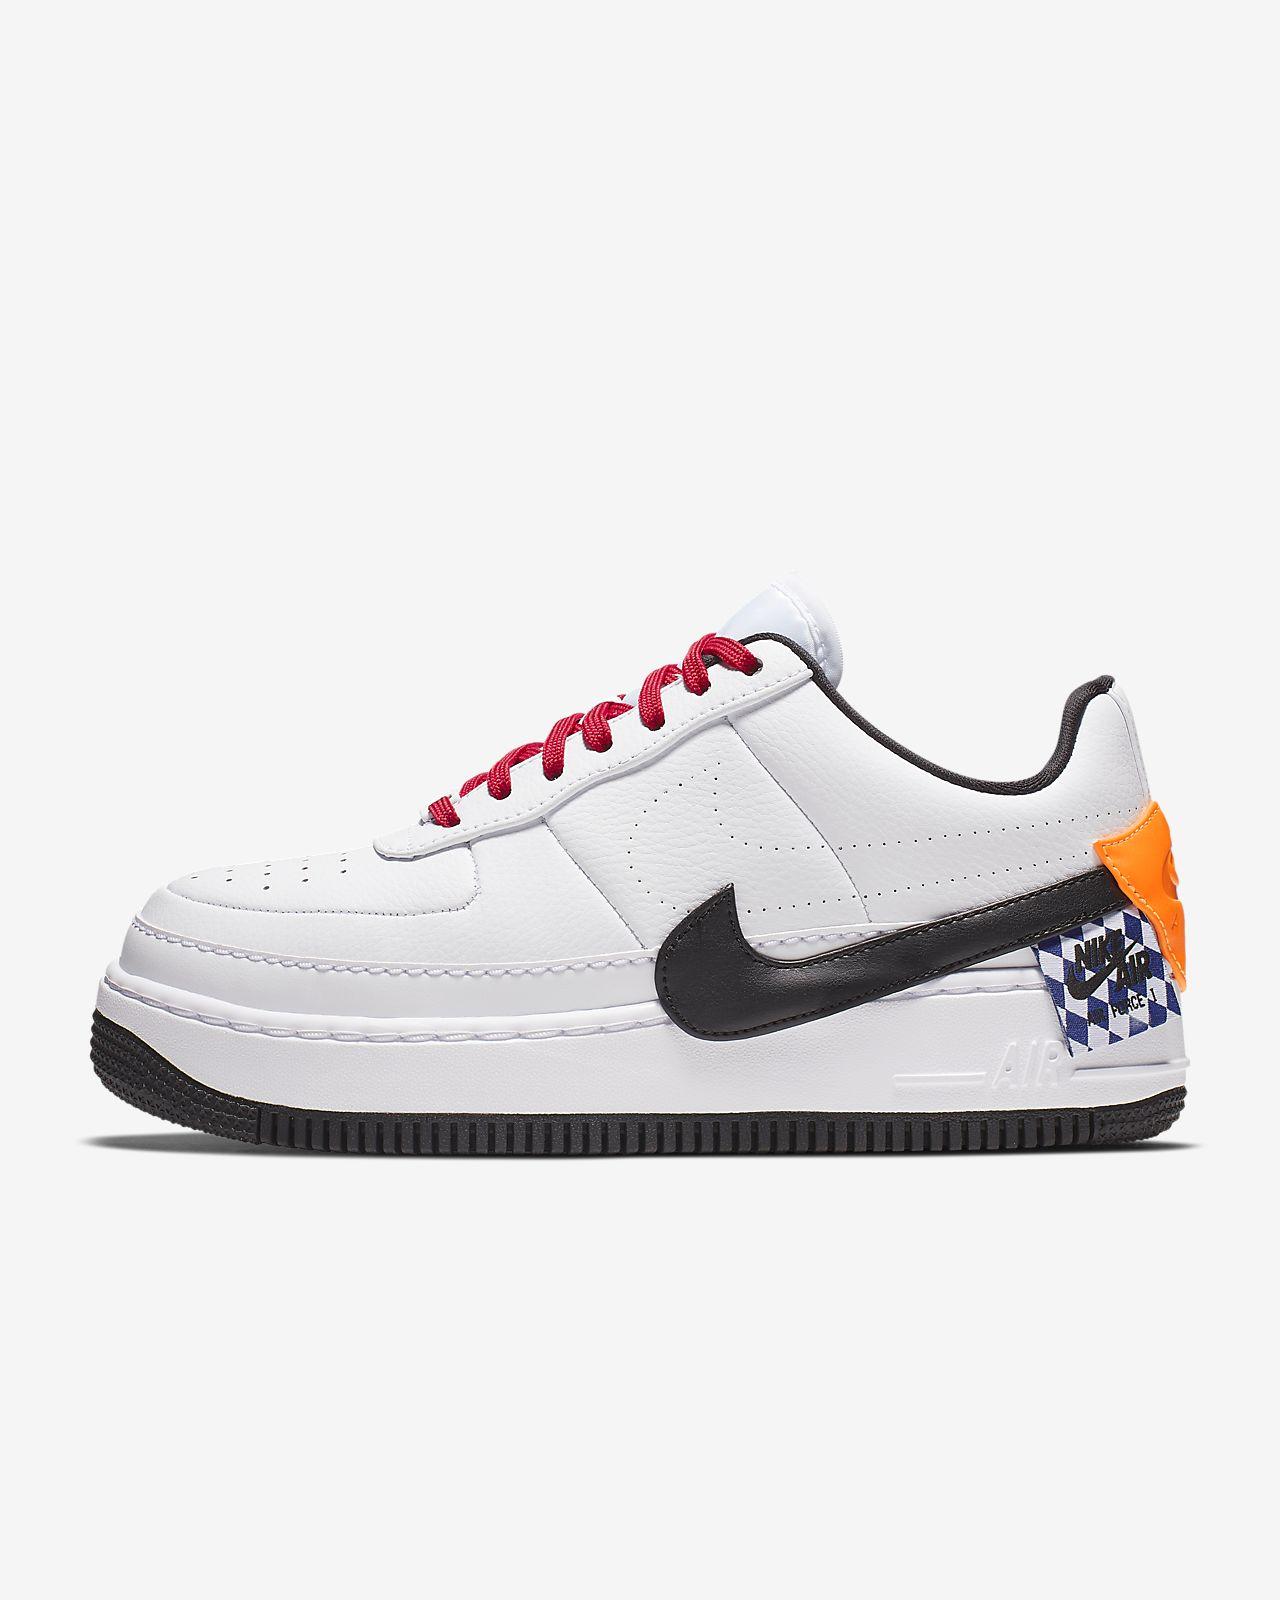 on sale 20168 6d04c ... Chaussure Nike AF1 Jester XX SE pour Femme